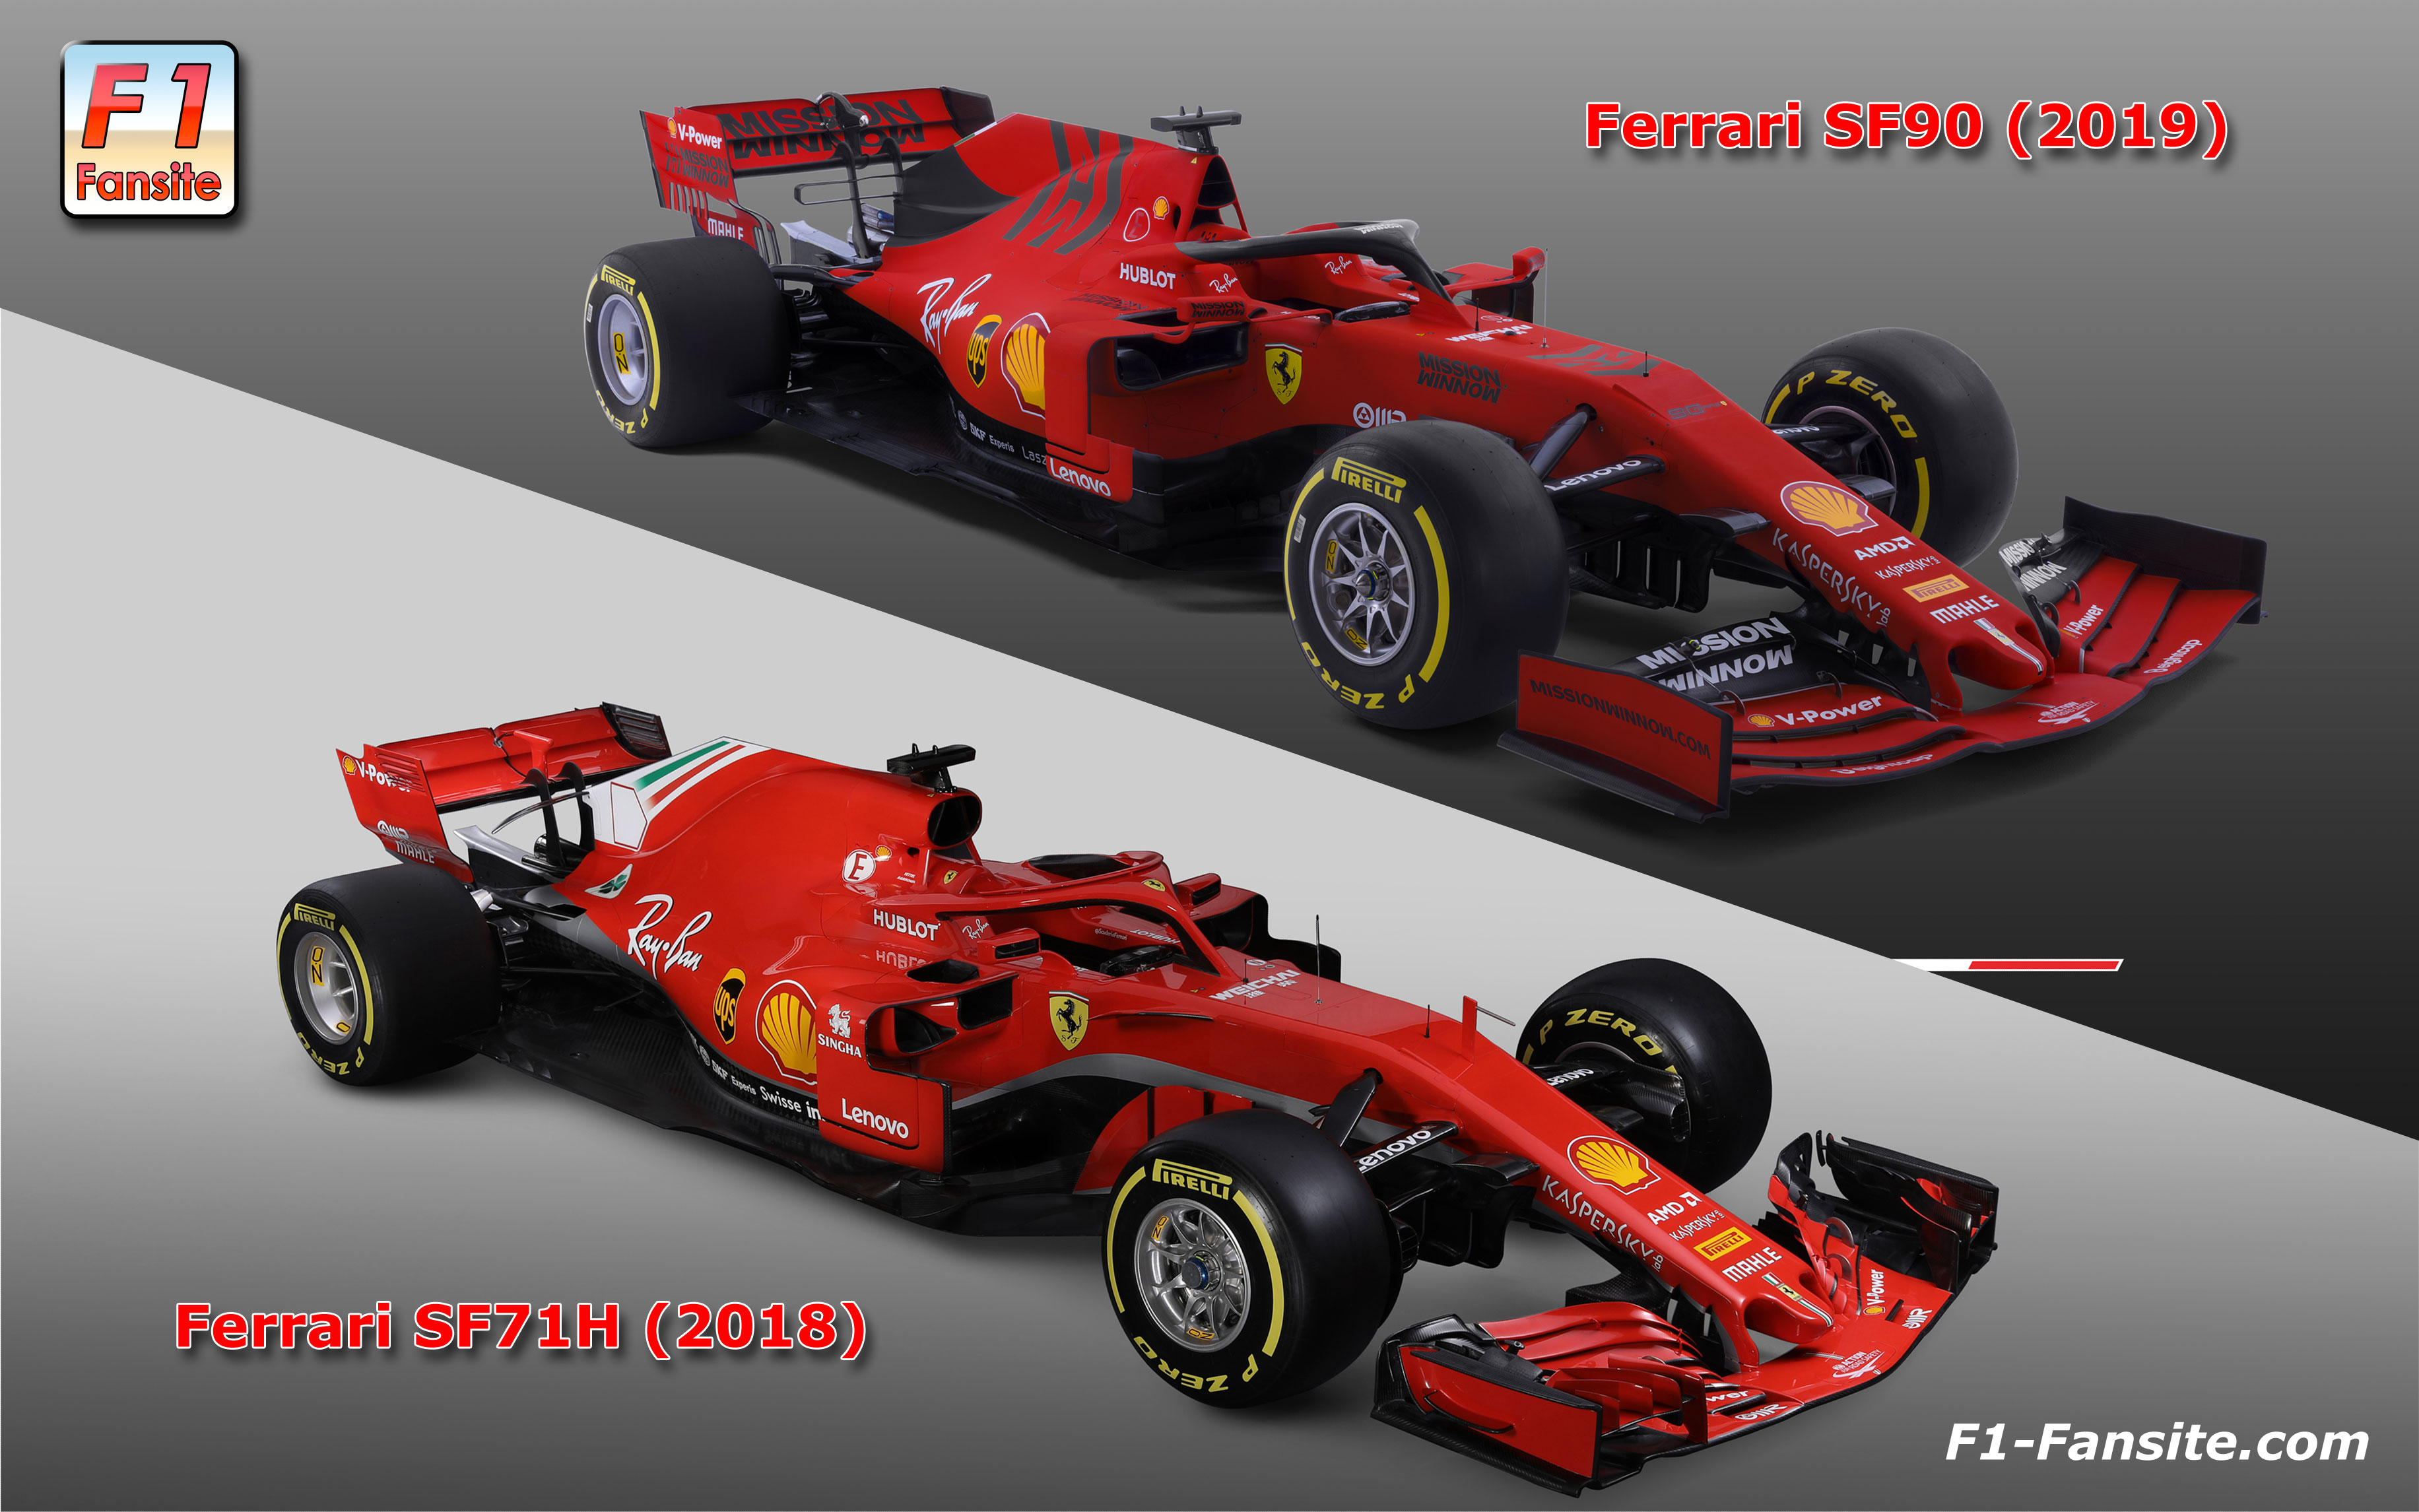 Ferrari-SF90-VS-SF71H-front-right-view.jpg